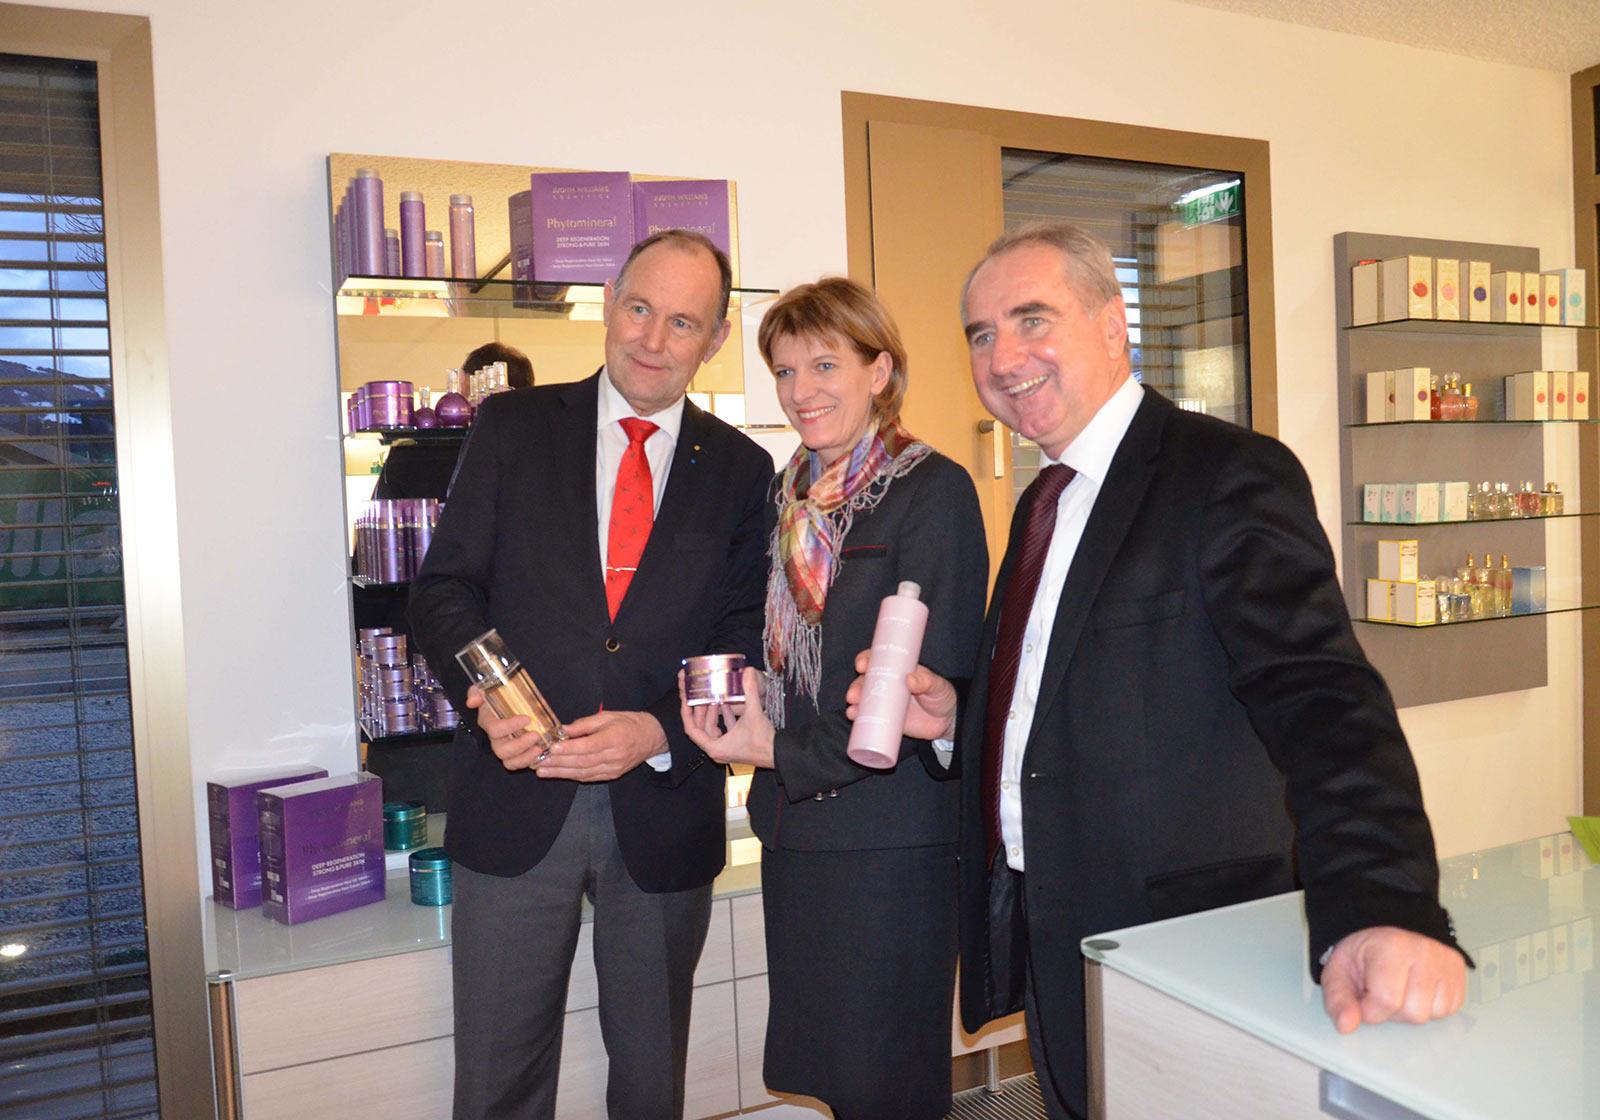 The lawyer Franz Pegger, Mayor Christine Oppitz-Plörer and Cura Managing Director Roland Kohl. Photo: Cura/Kohl